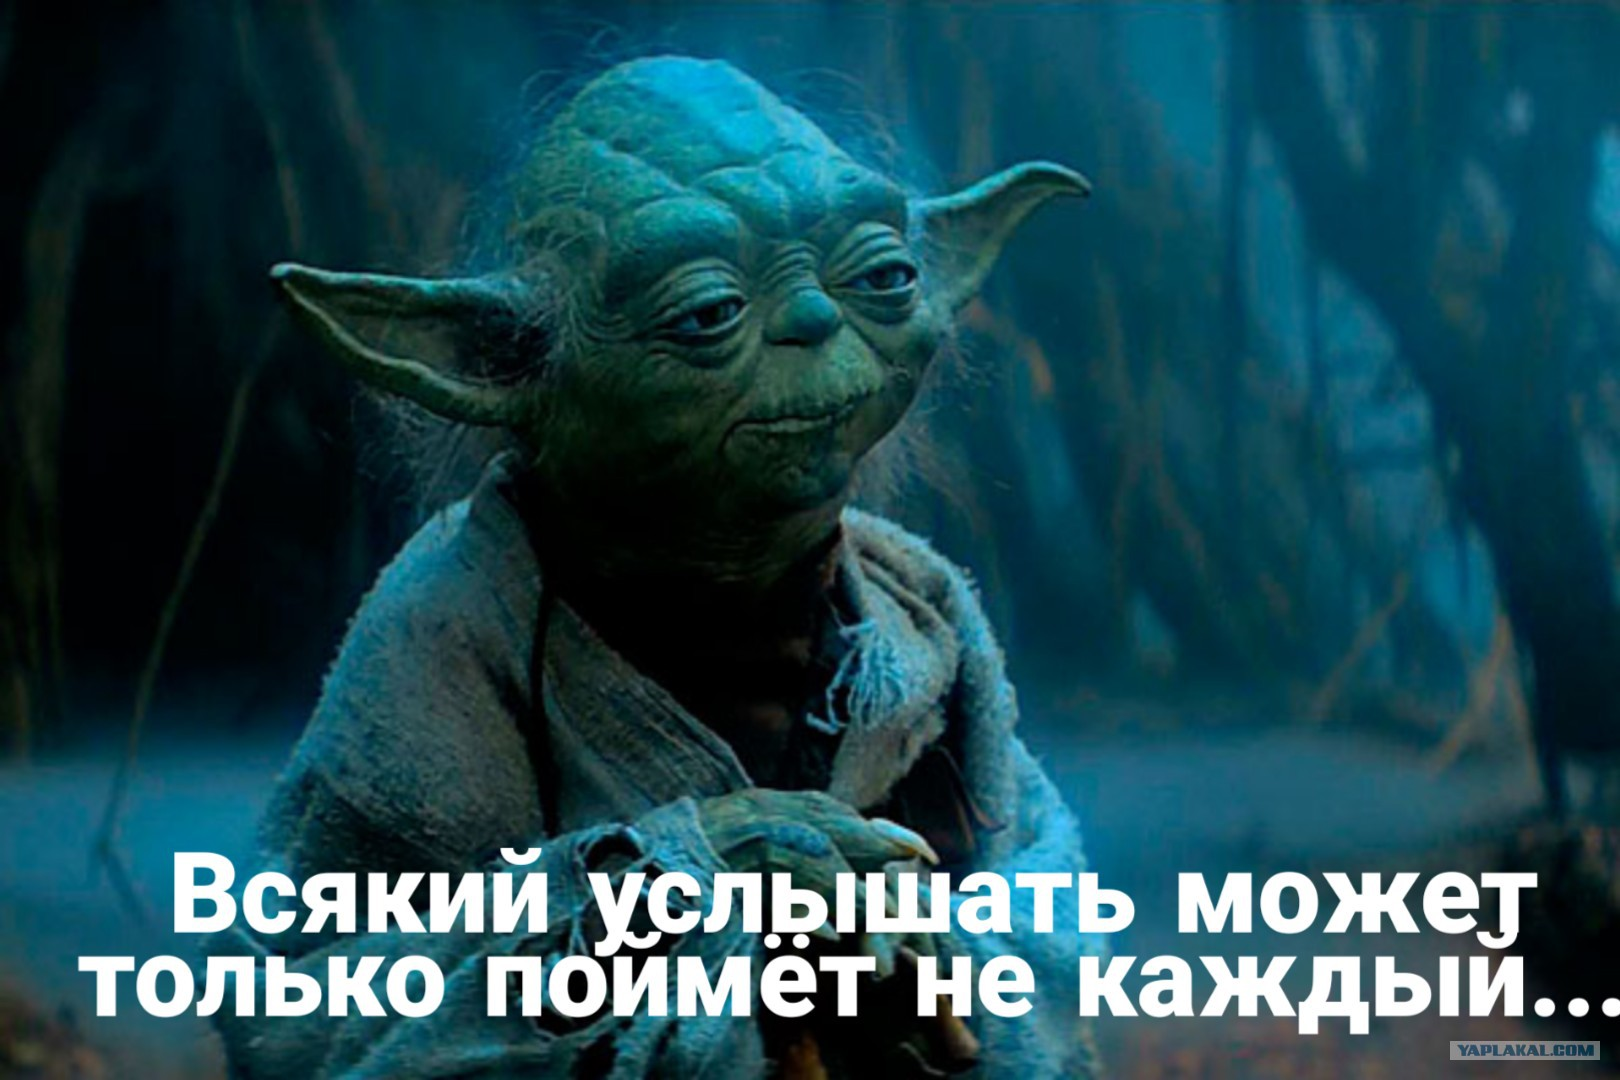 В Белгороде уволили Людмилу Грекову за гимн Звездных войн для мэра